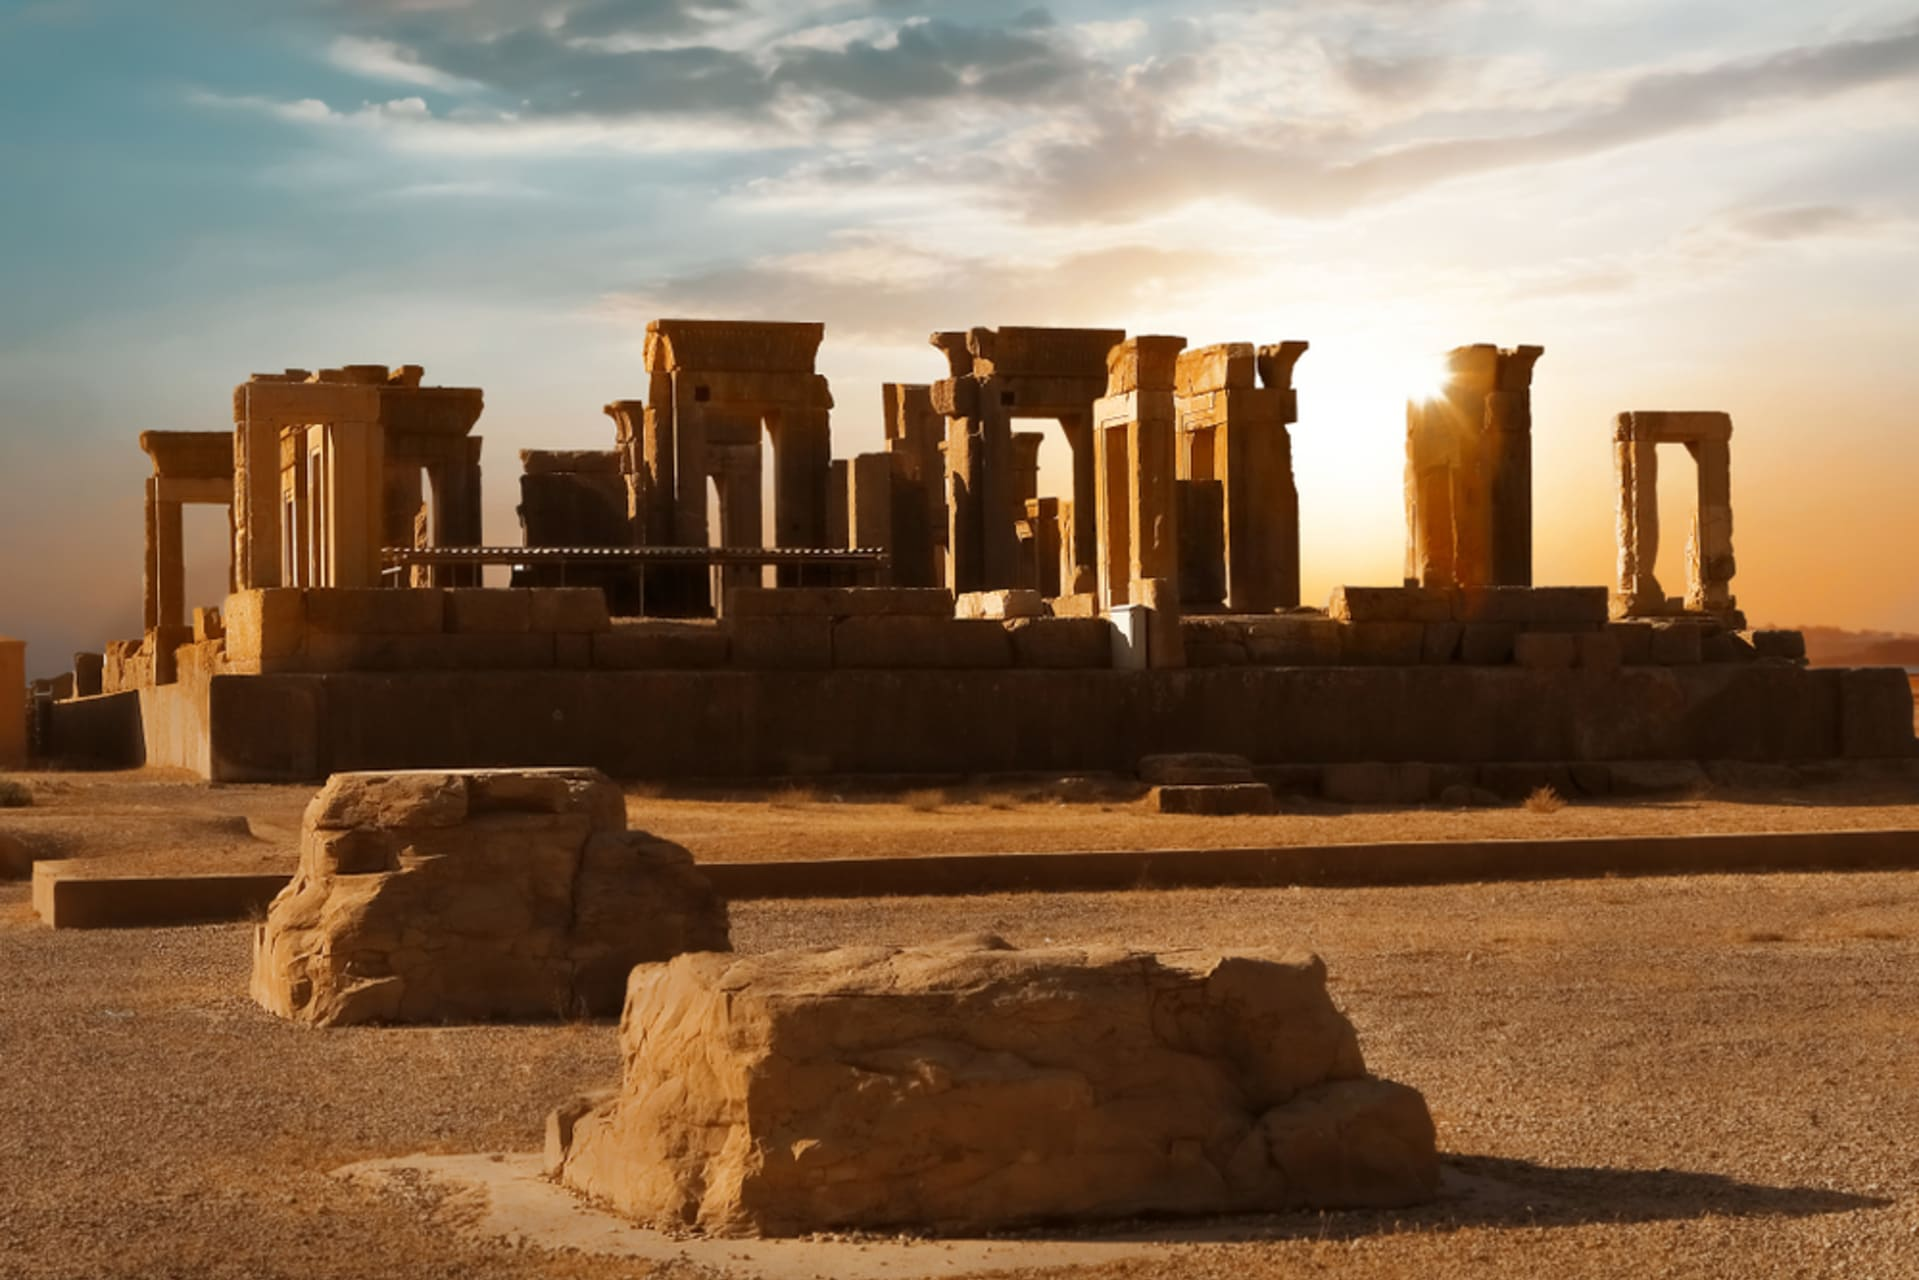 Persepolis and Necropolis - Persepolis, The Ancient Persian Empire: Part II